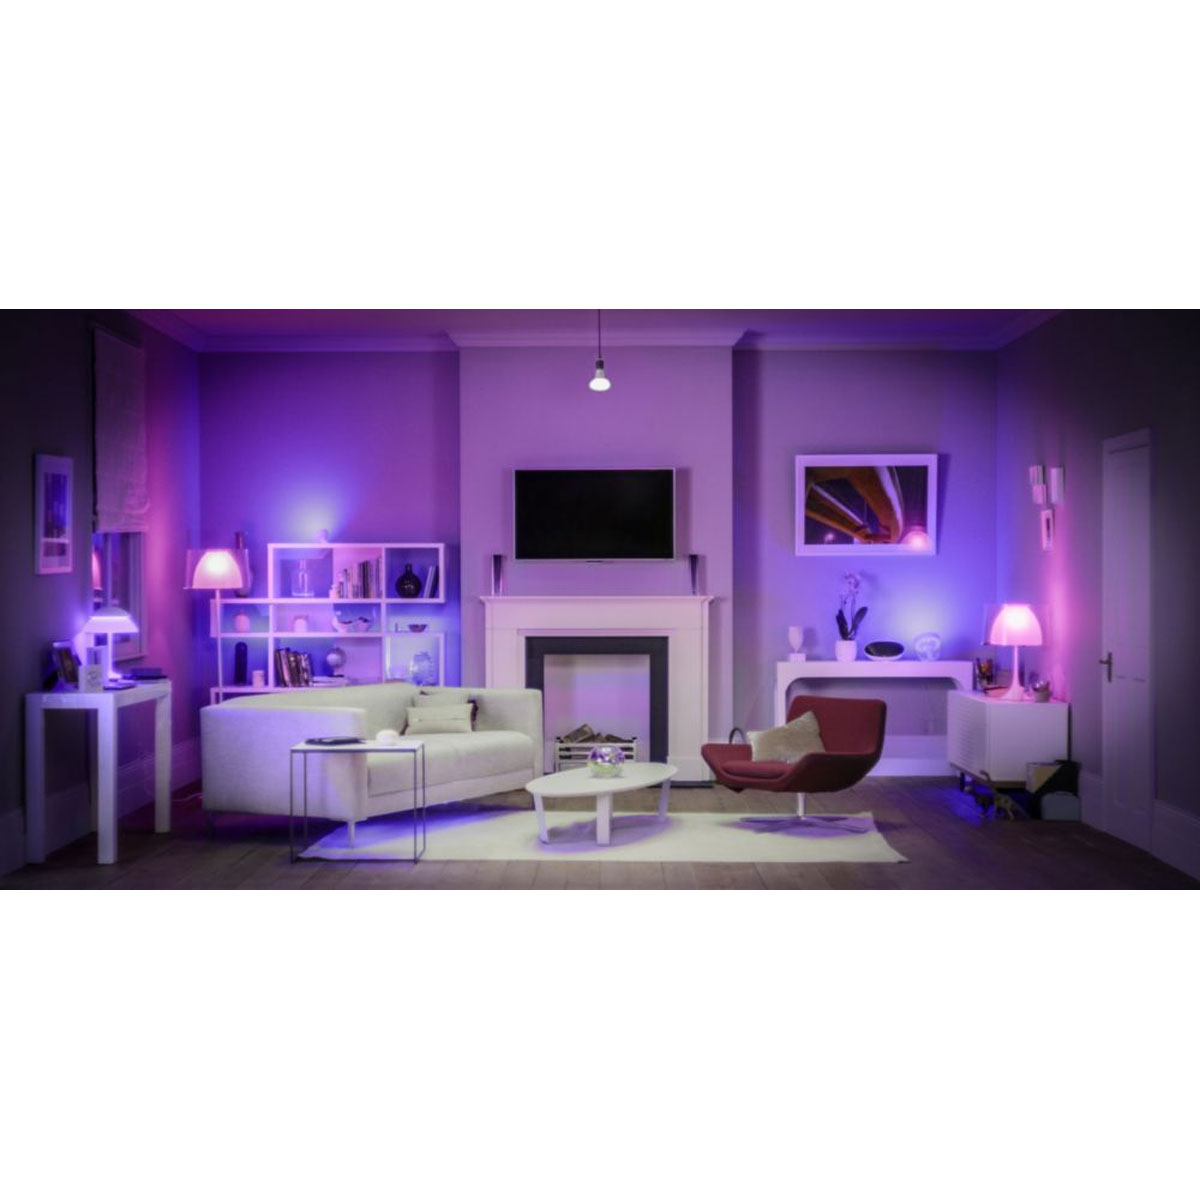 philips hue gu10 starterset kopen bestel veilig online. Black Bedroom Furniture Sets. Home Design Ideas